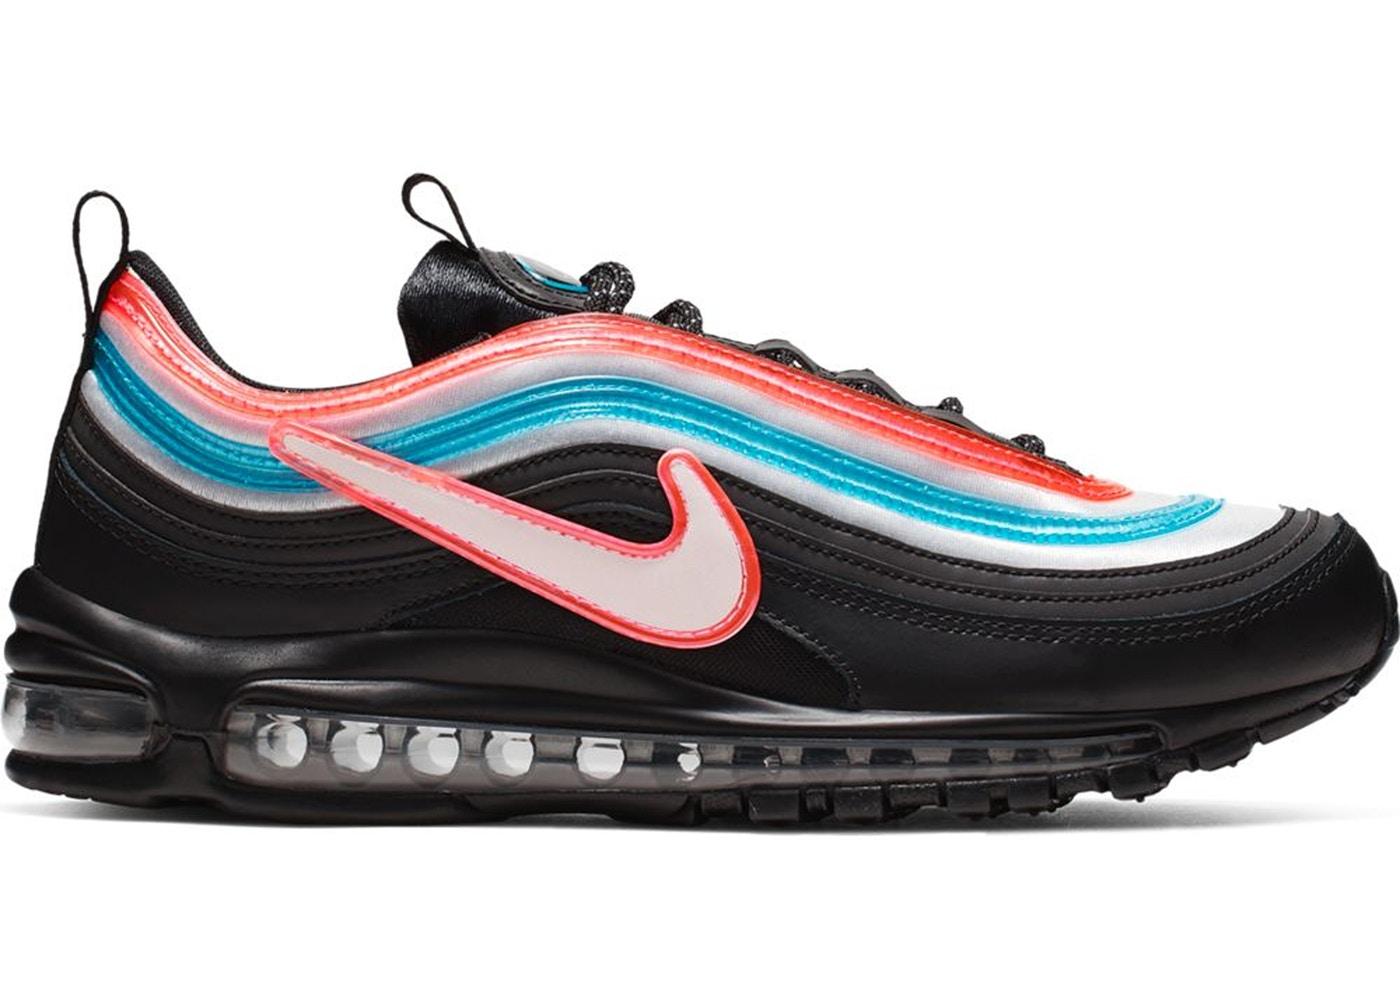 uk availability 9dd9e 3a253 Restock: Nike Air Max 97